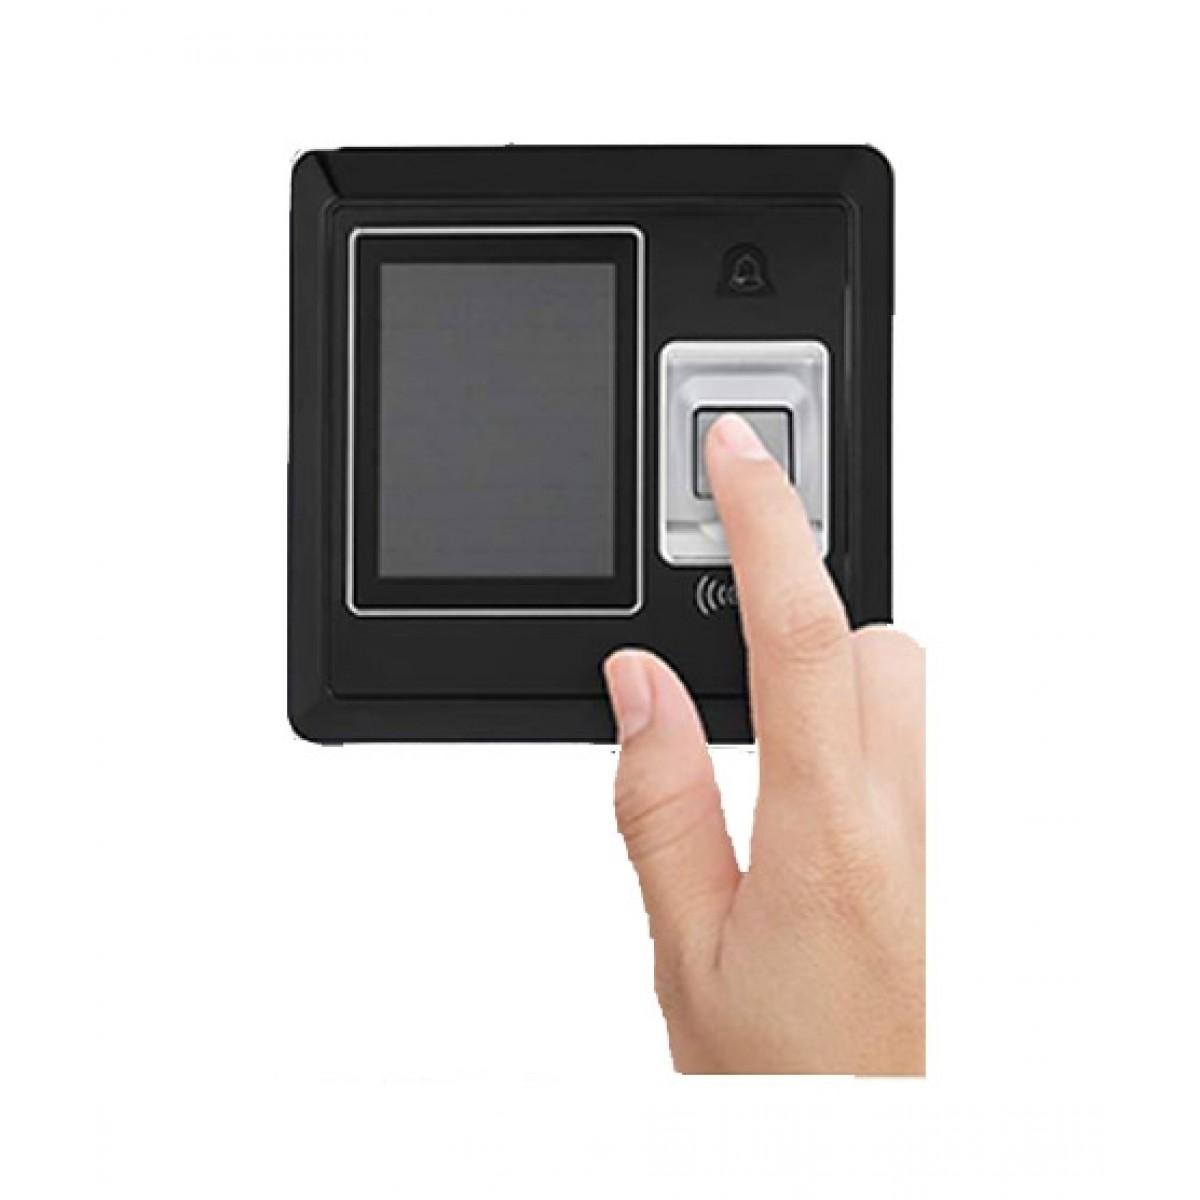 Proxymedia Face & Fingerprint Attendance Machine (MR660)